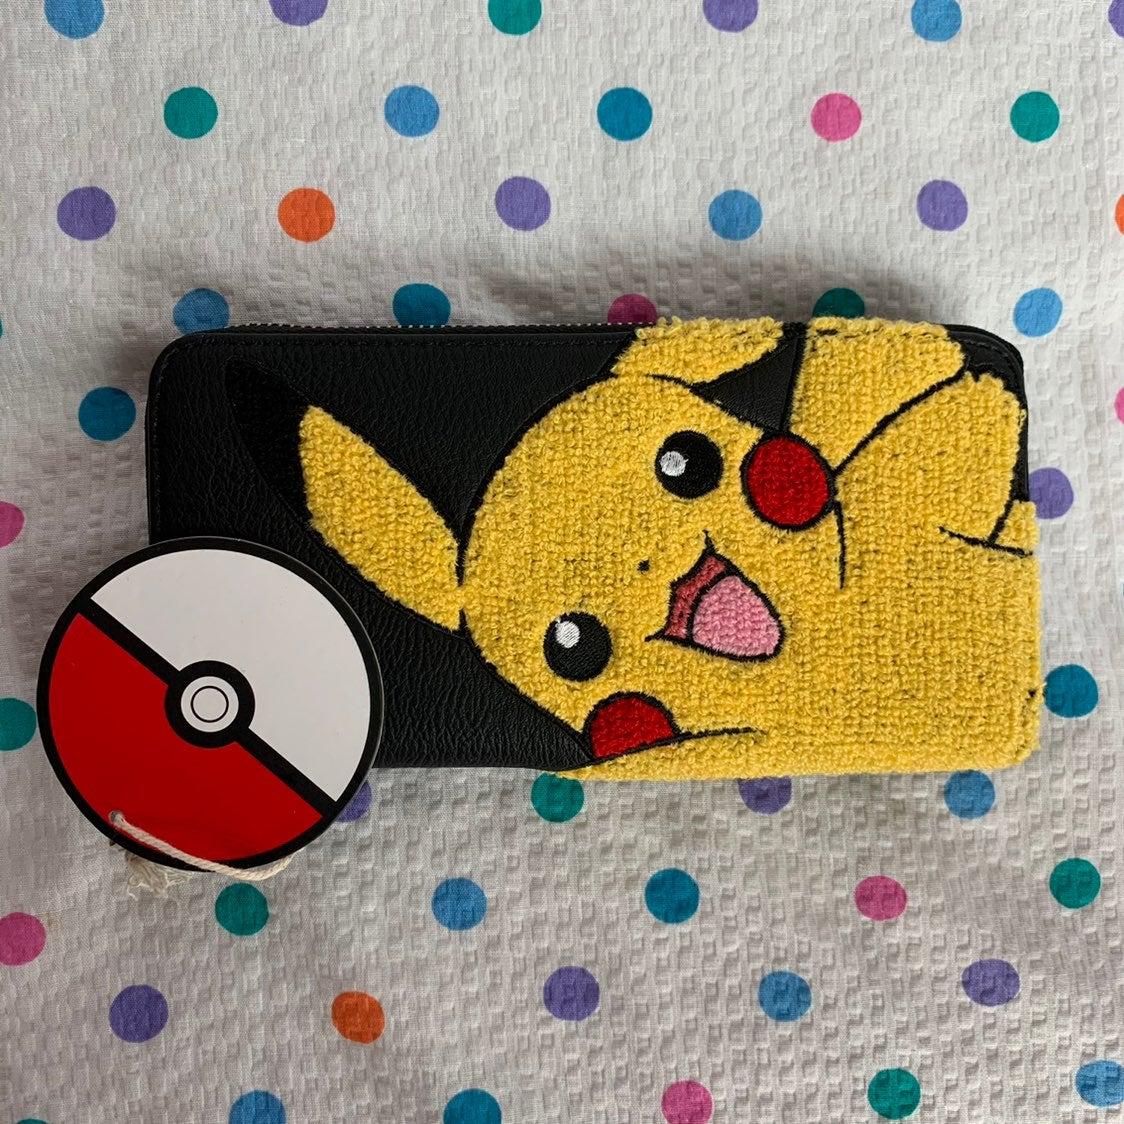 Pokémon Loungefly Wallet